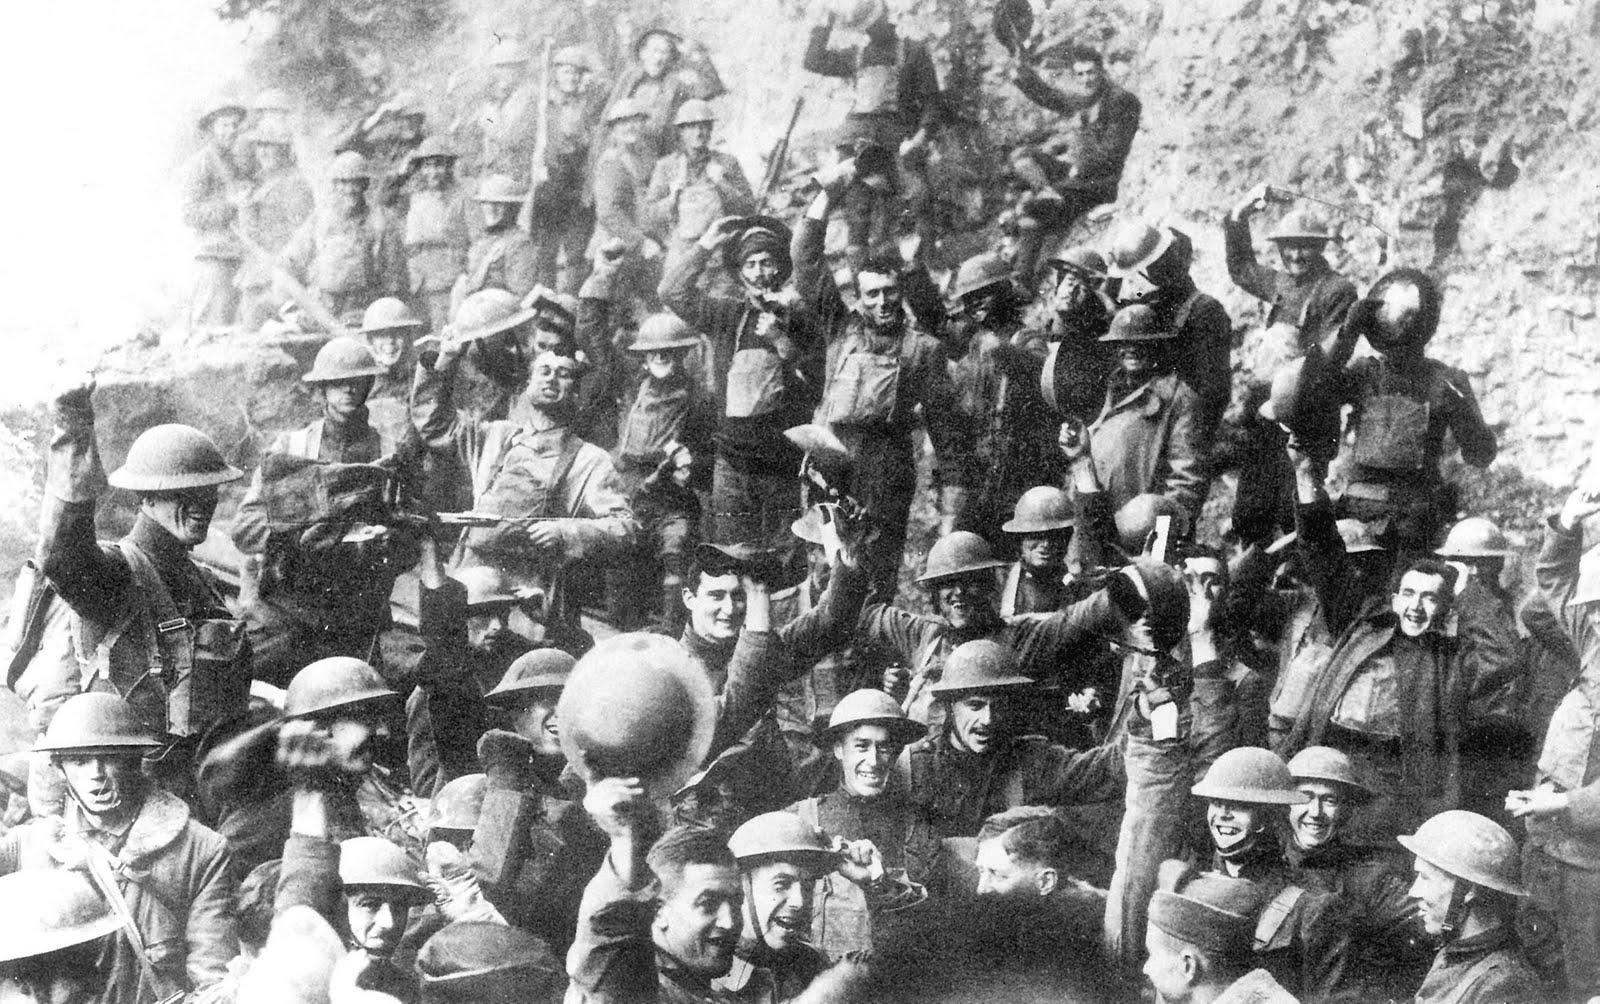 Armistice Day November 11, 1918